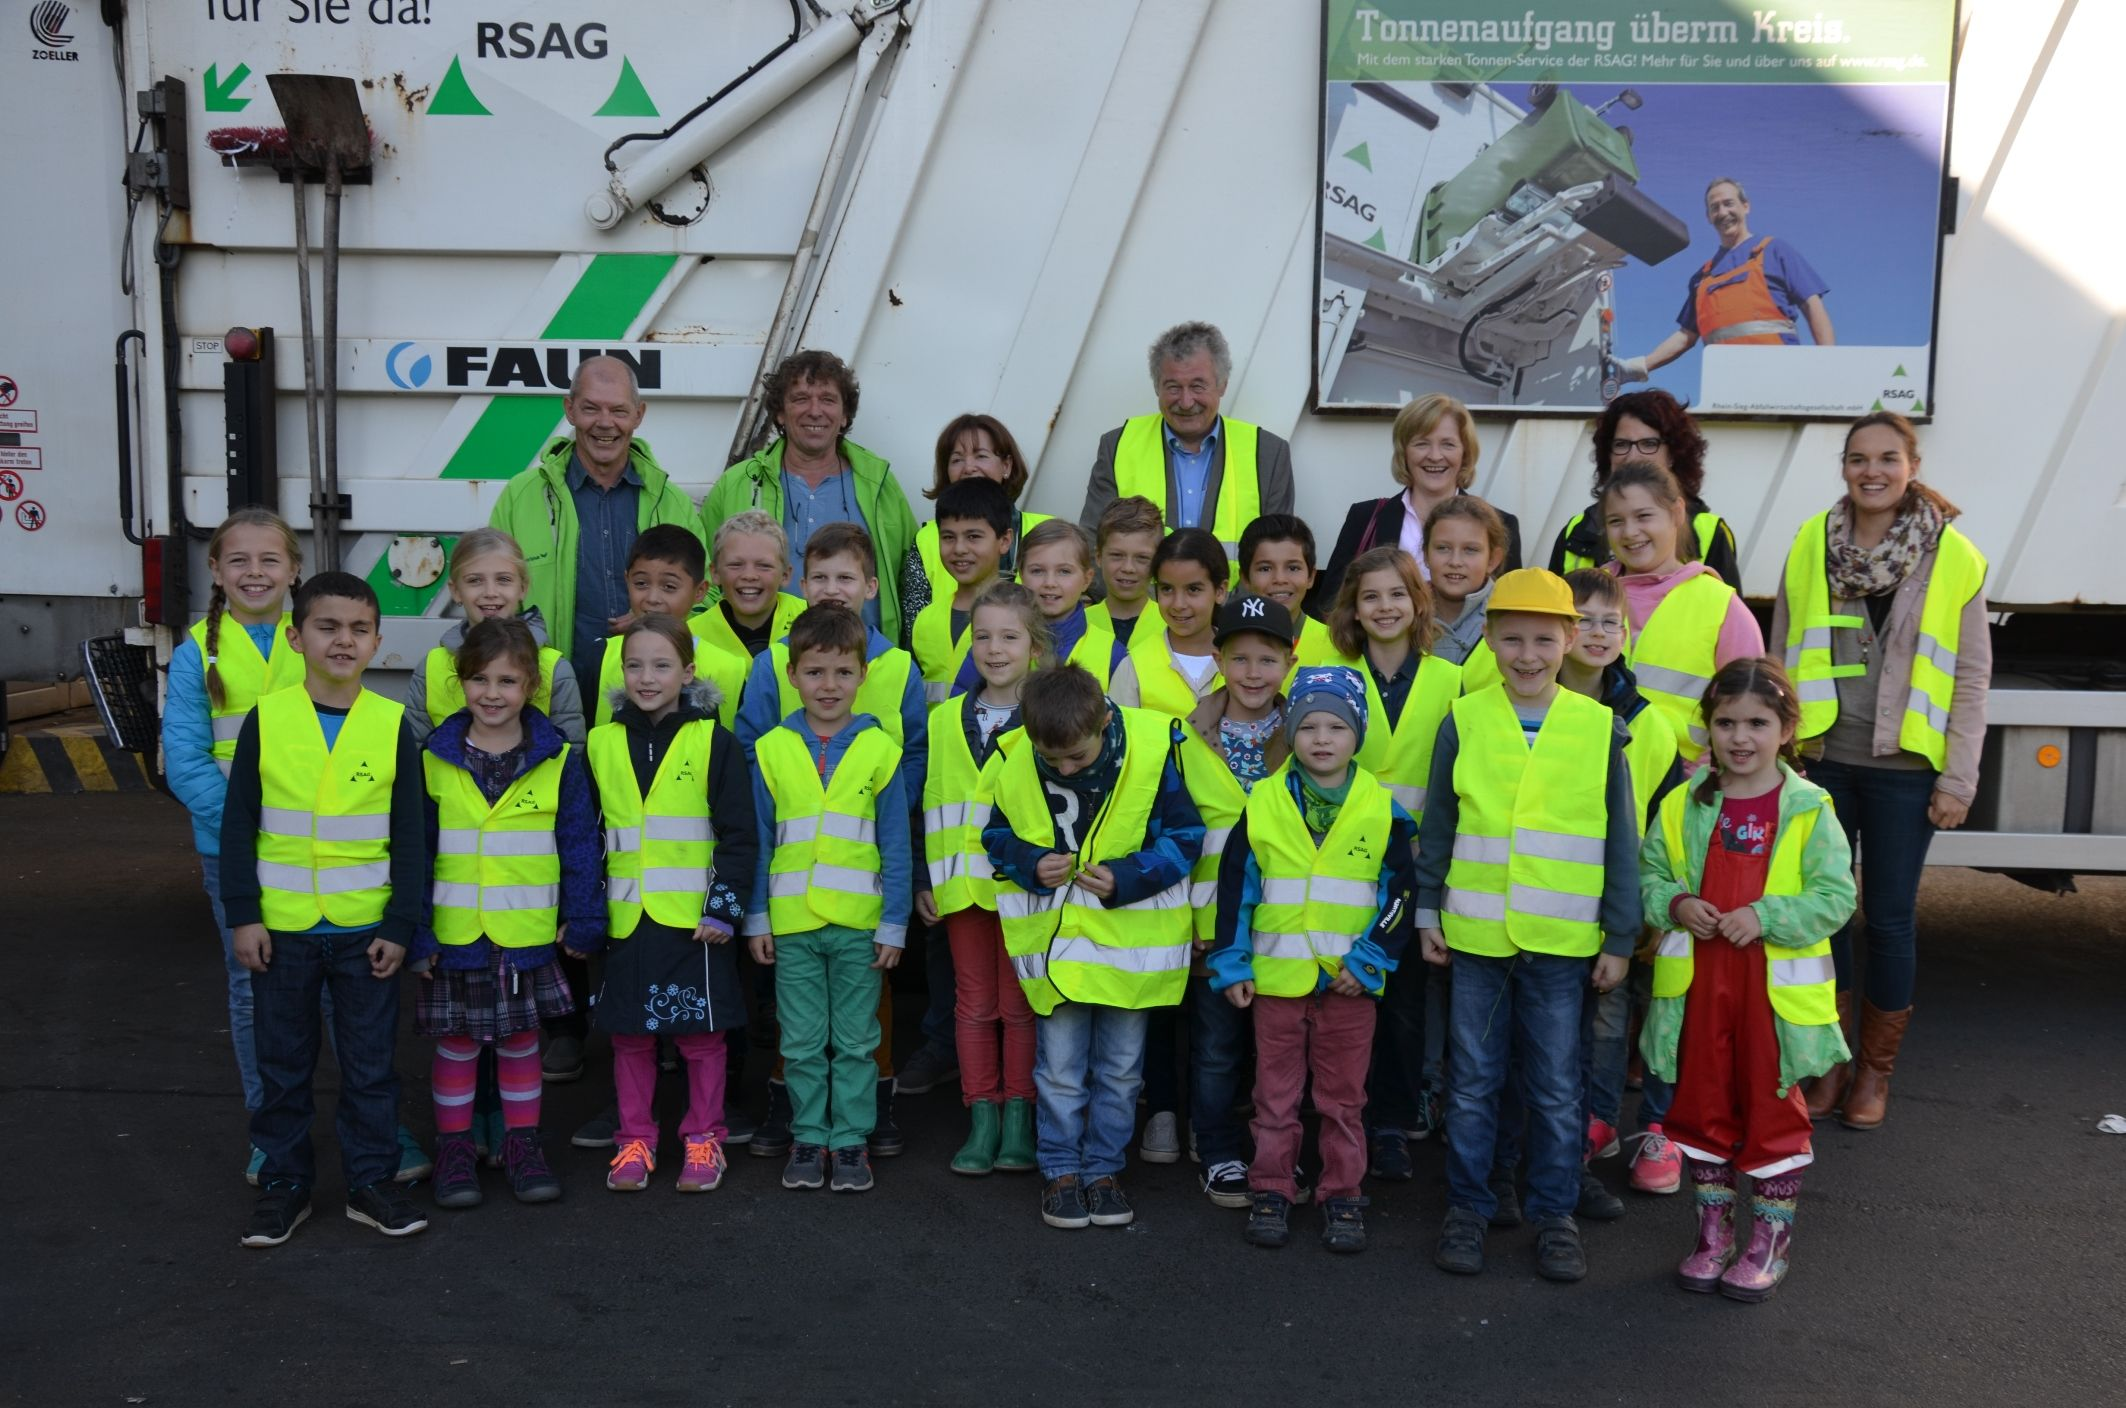 Escola Municipal Irmã Leodgard Gausepohl Produções: Berlin Fördert Kinder Für Klimaschutz